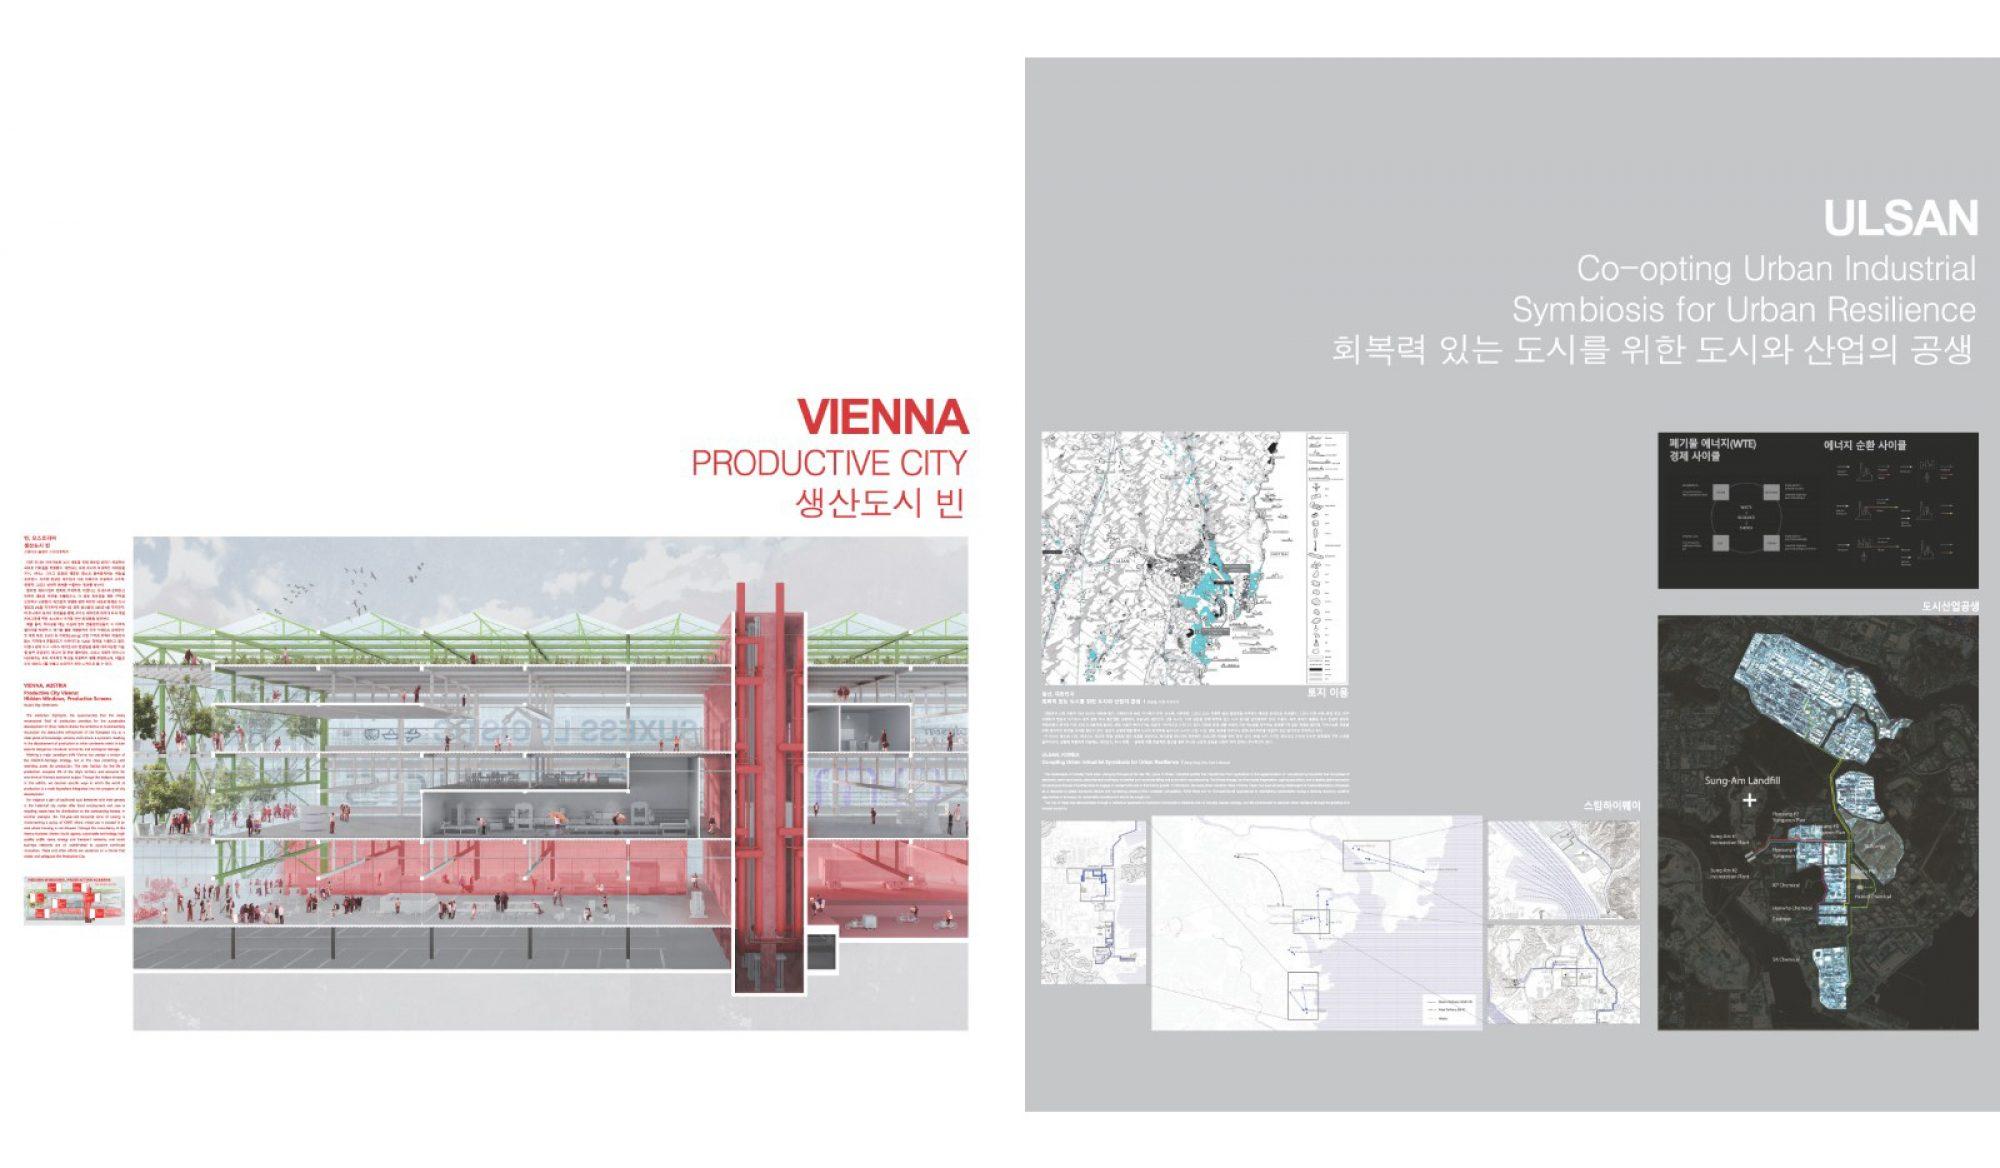 10 A2_G3_Mixing_Left_Vienna_Ulsan (Custom)